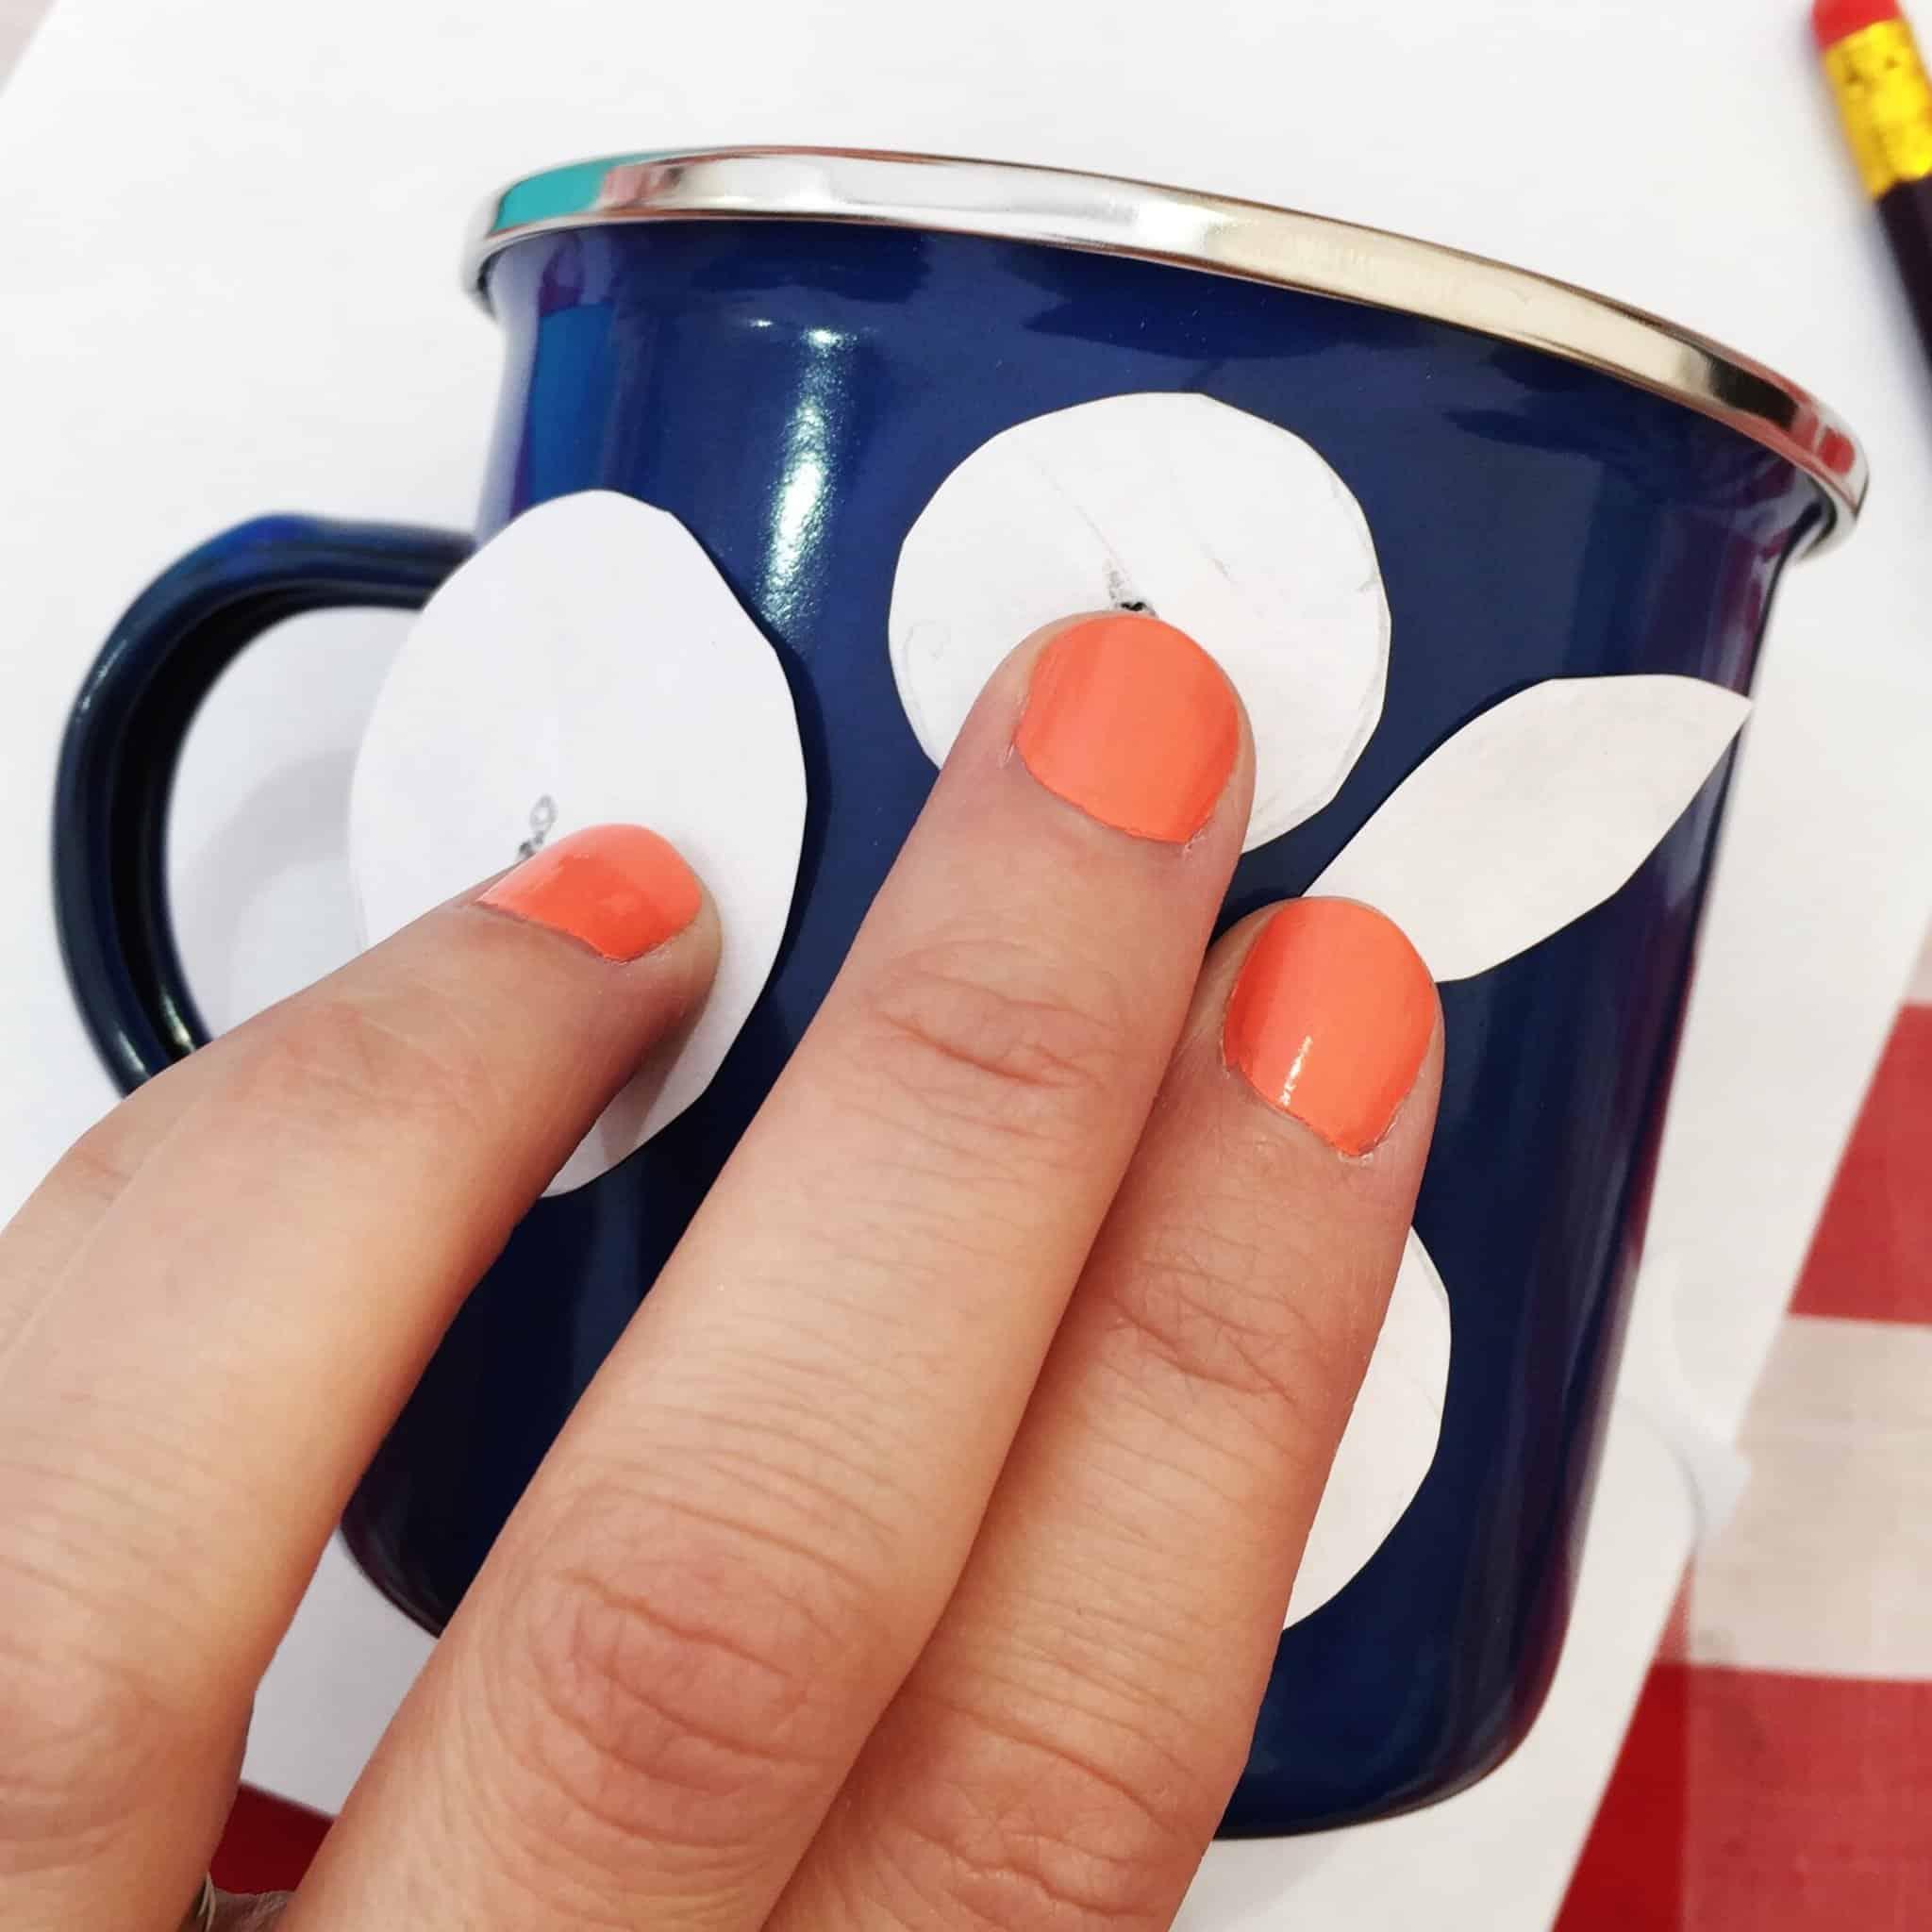 Positioning templates on enamel mug at The Handmade Fair 2016